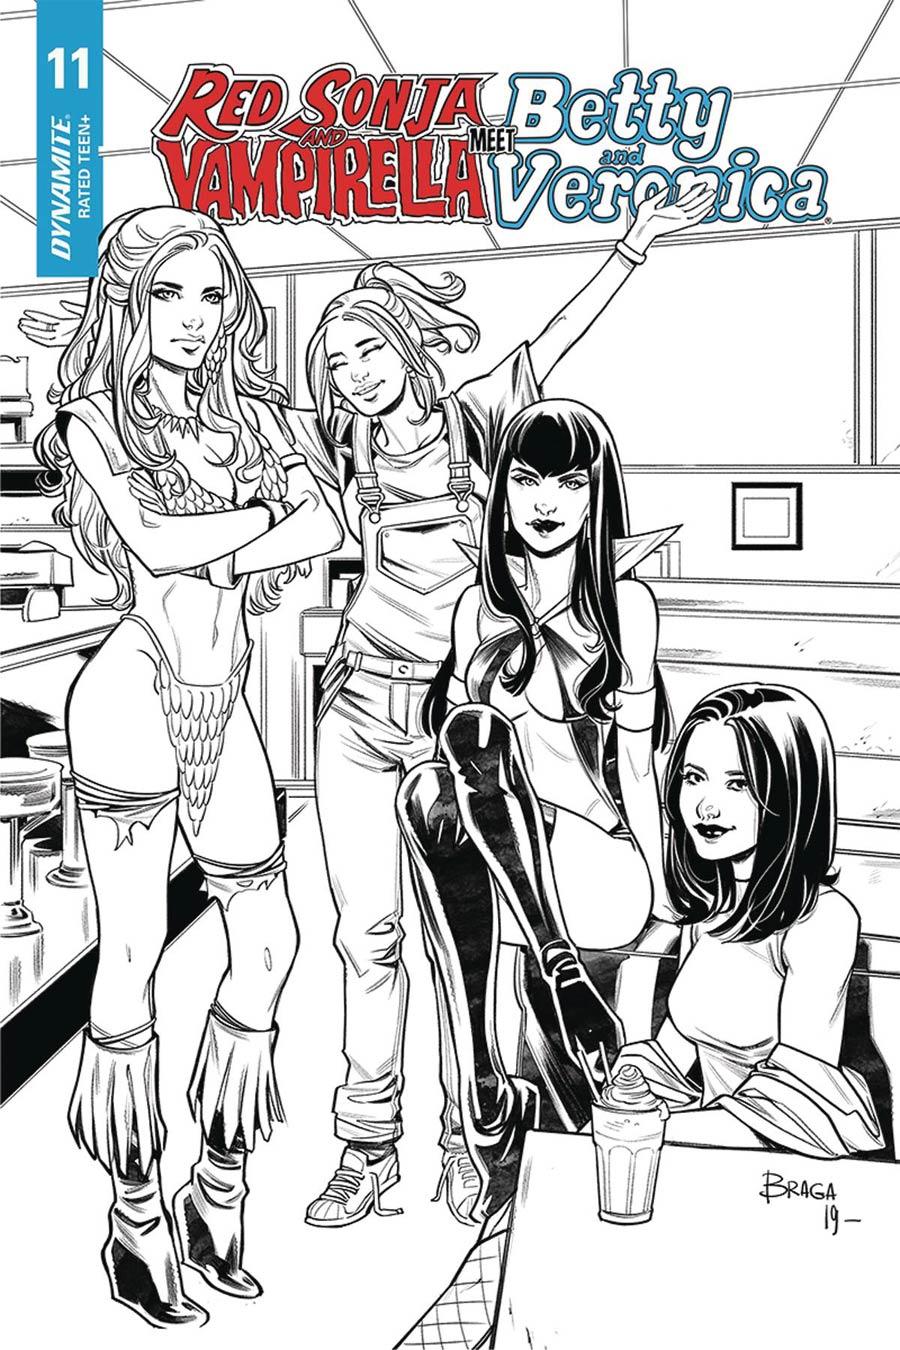 Red Sonja And Vampirella Meet Betty And Veronica #11 Cover J Incentive Laura Braga Black & White Cover